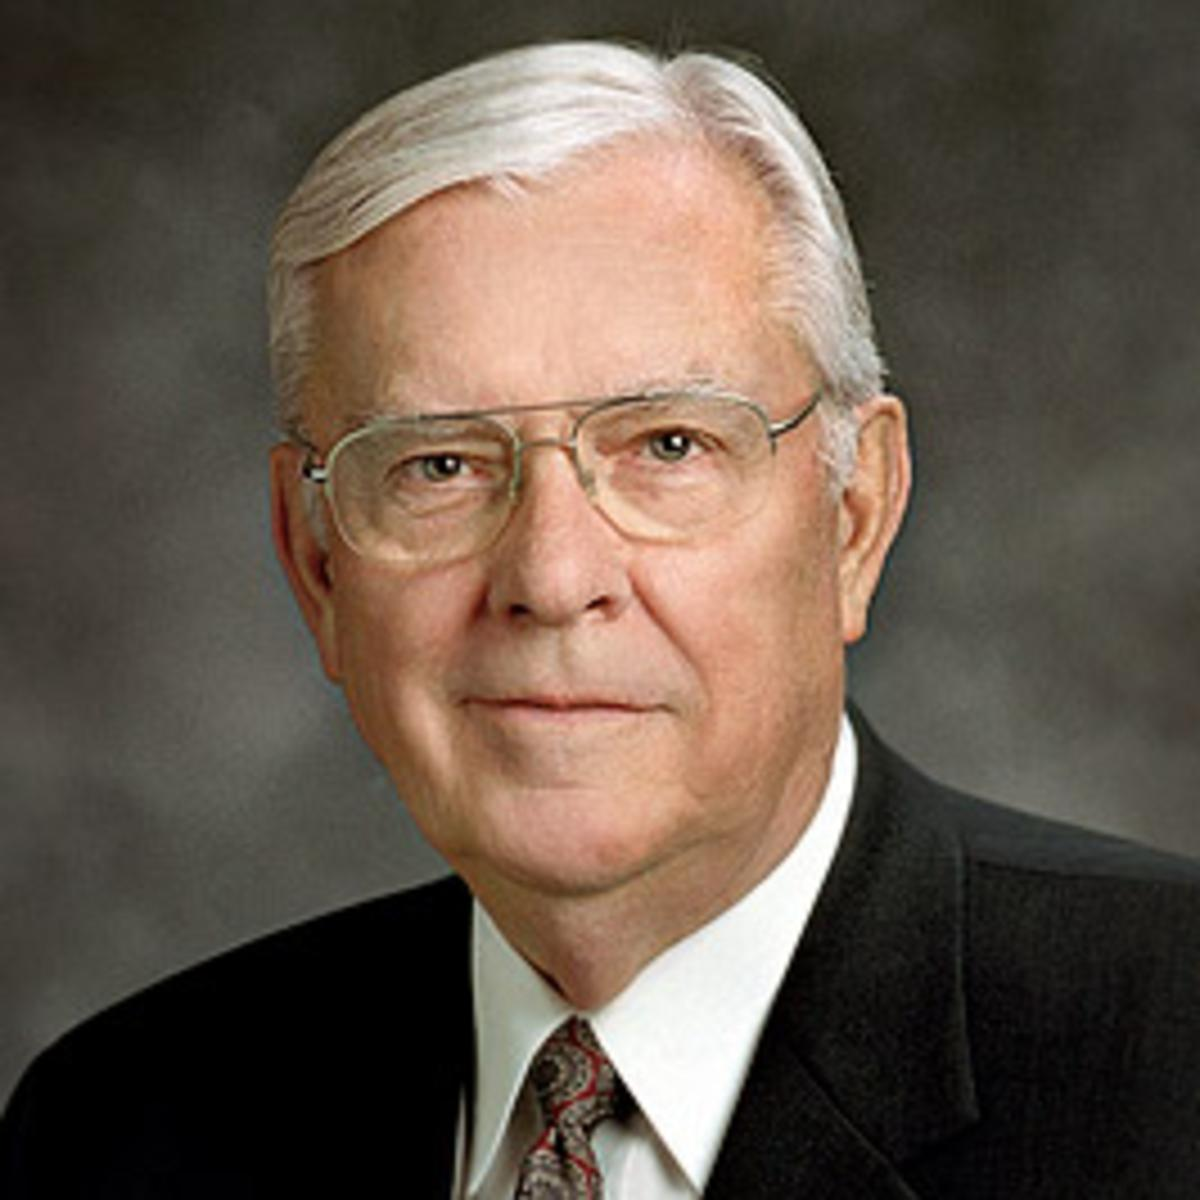 Presidente M. Russell Ballard